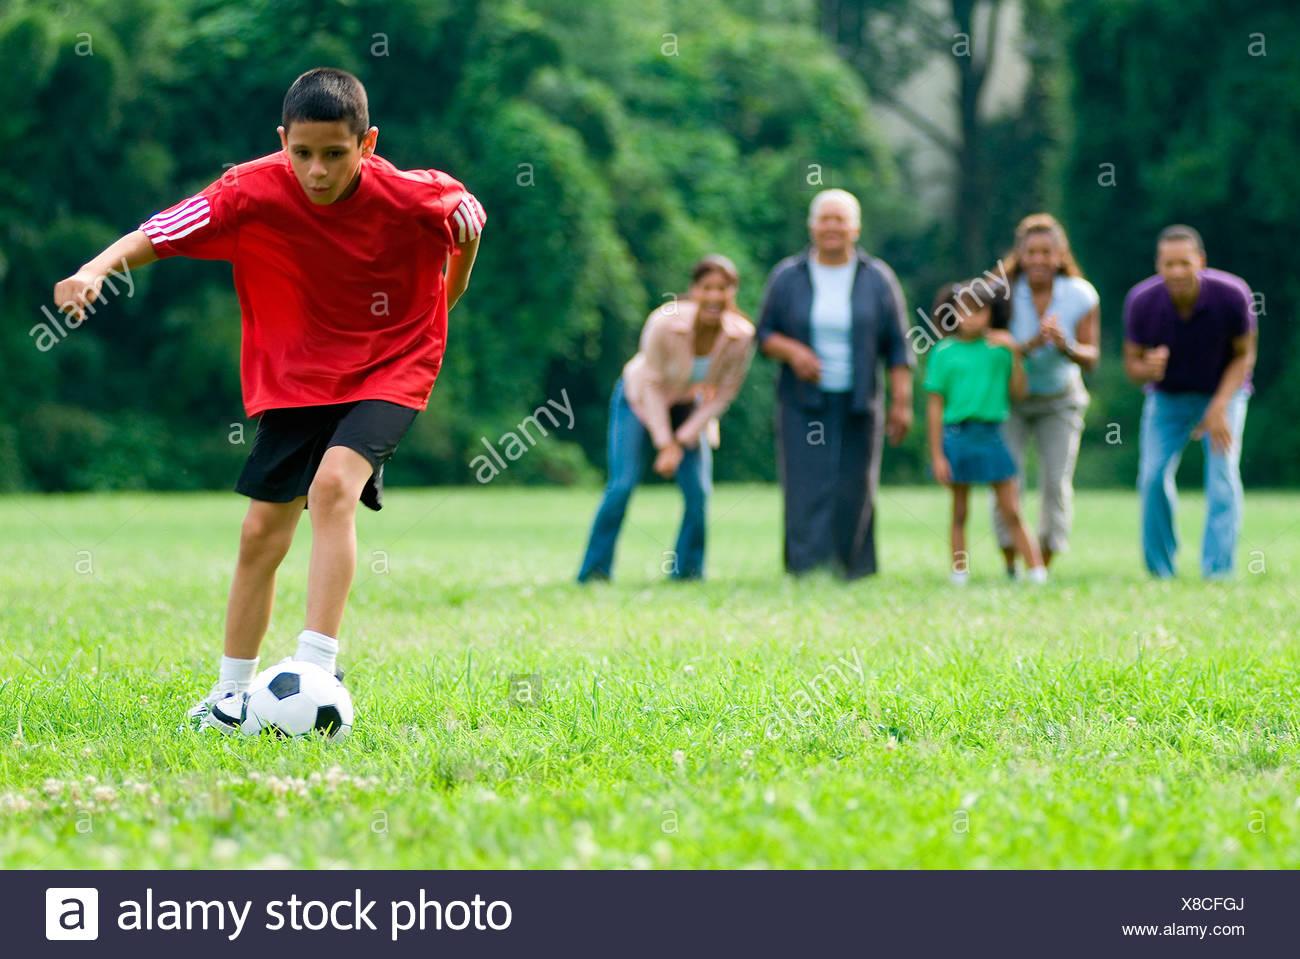 Young Hispanic boy kicking soccer ball as family watches - Stock Image